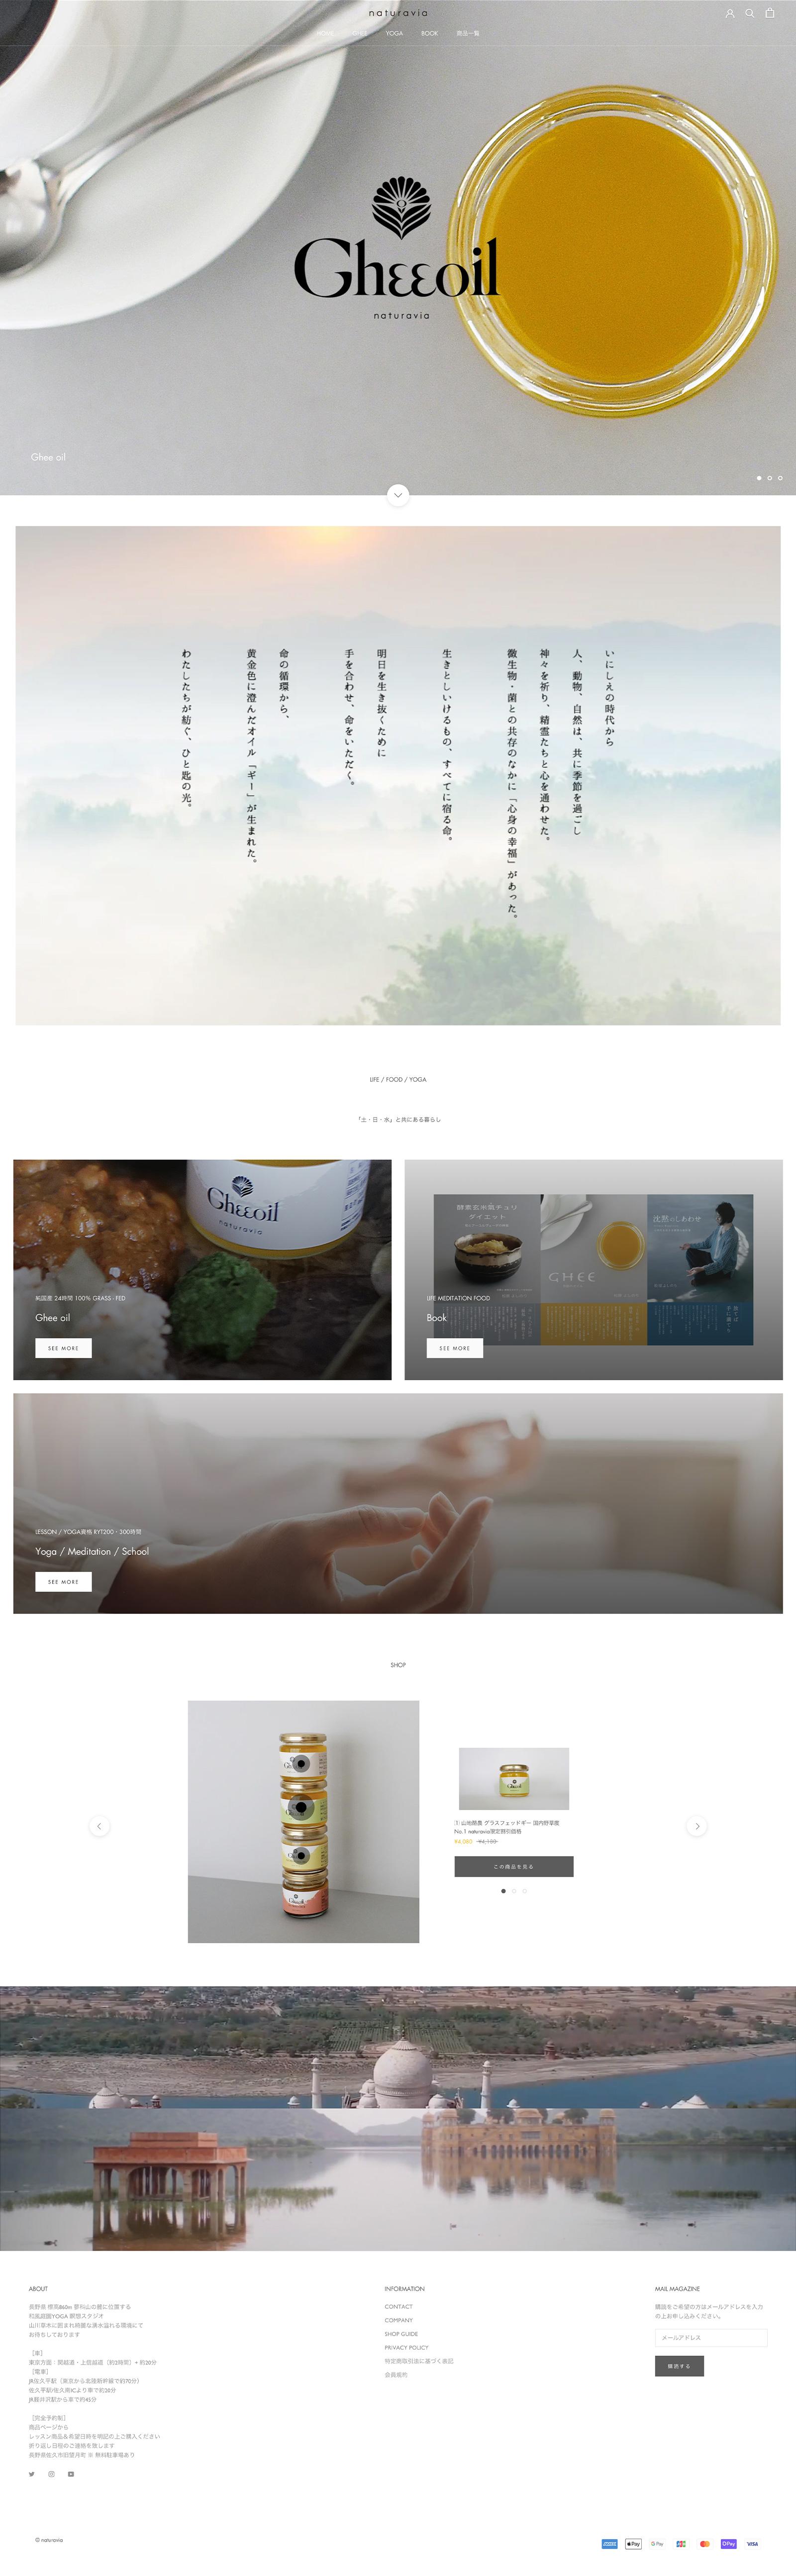 https://artpeace.jp/wp-content/uploads/2021/06/flame_sample-1.png